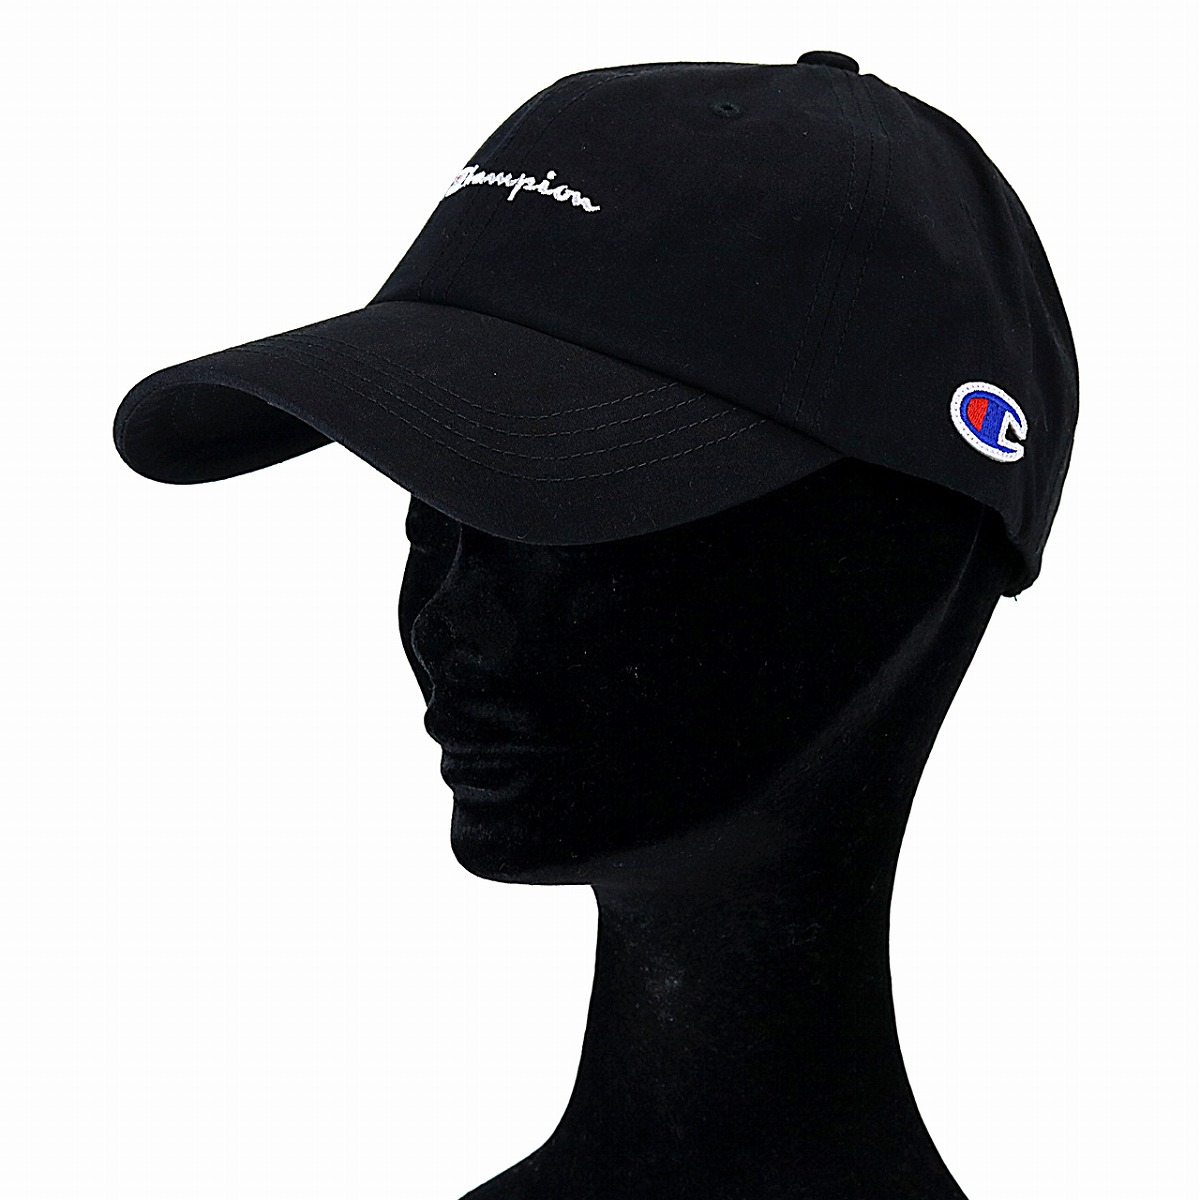 8185d40e92b Champion cap black men champion low cap Lady s logo cap Shin pull plain  casual coordinates hat sports cap unisex adjustable size   black  baseball  cap  ...